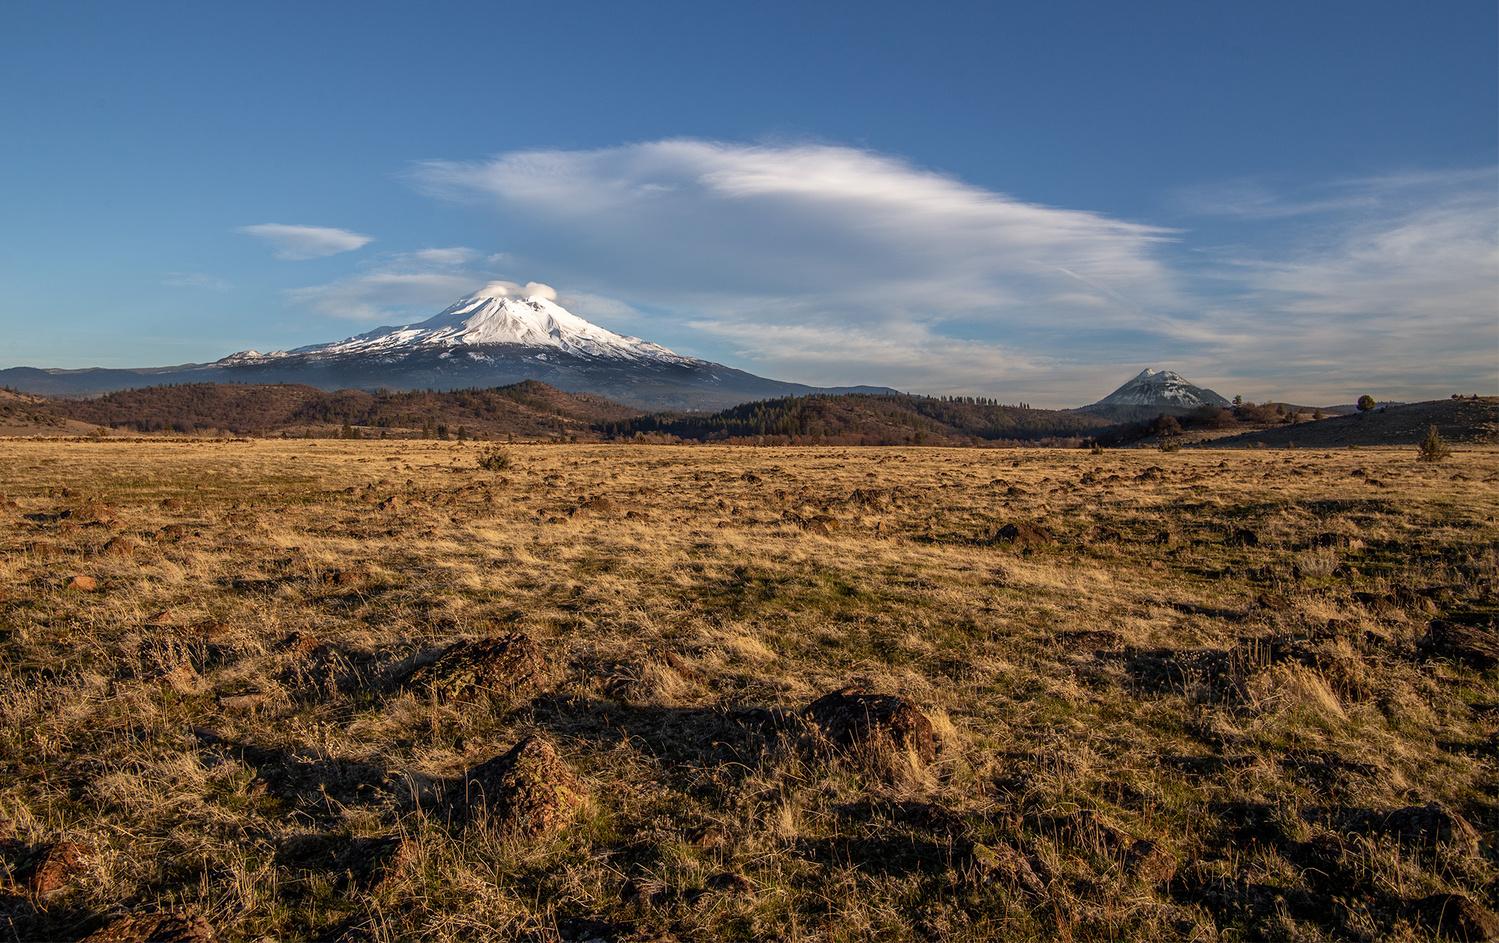 Mt Shasta by Stefan Olsson